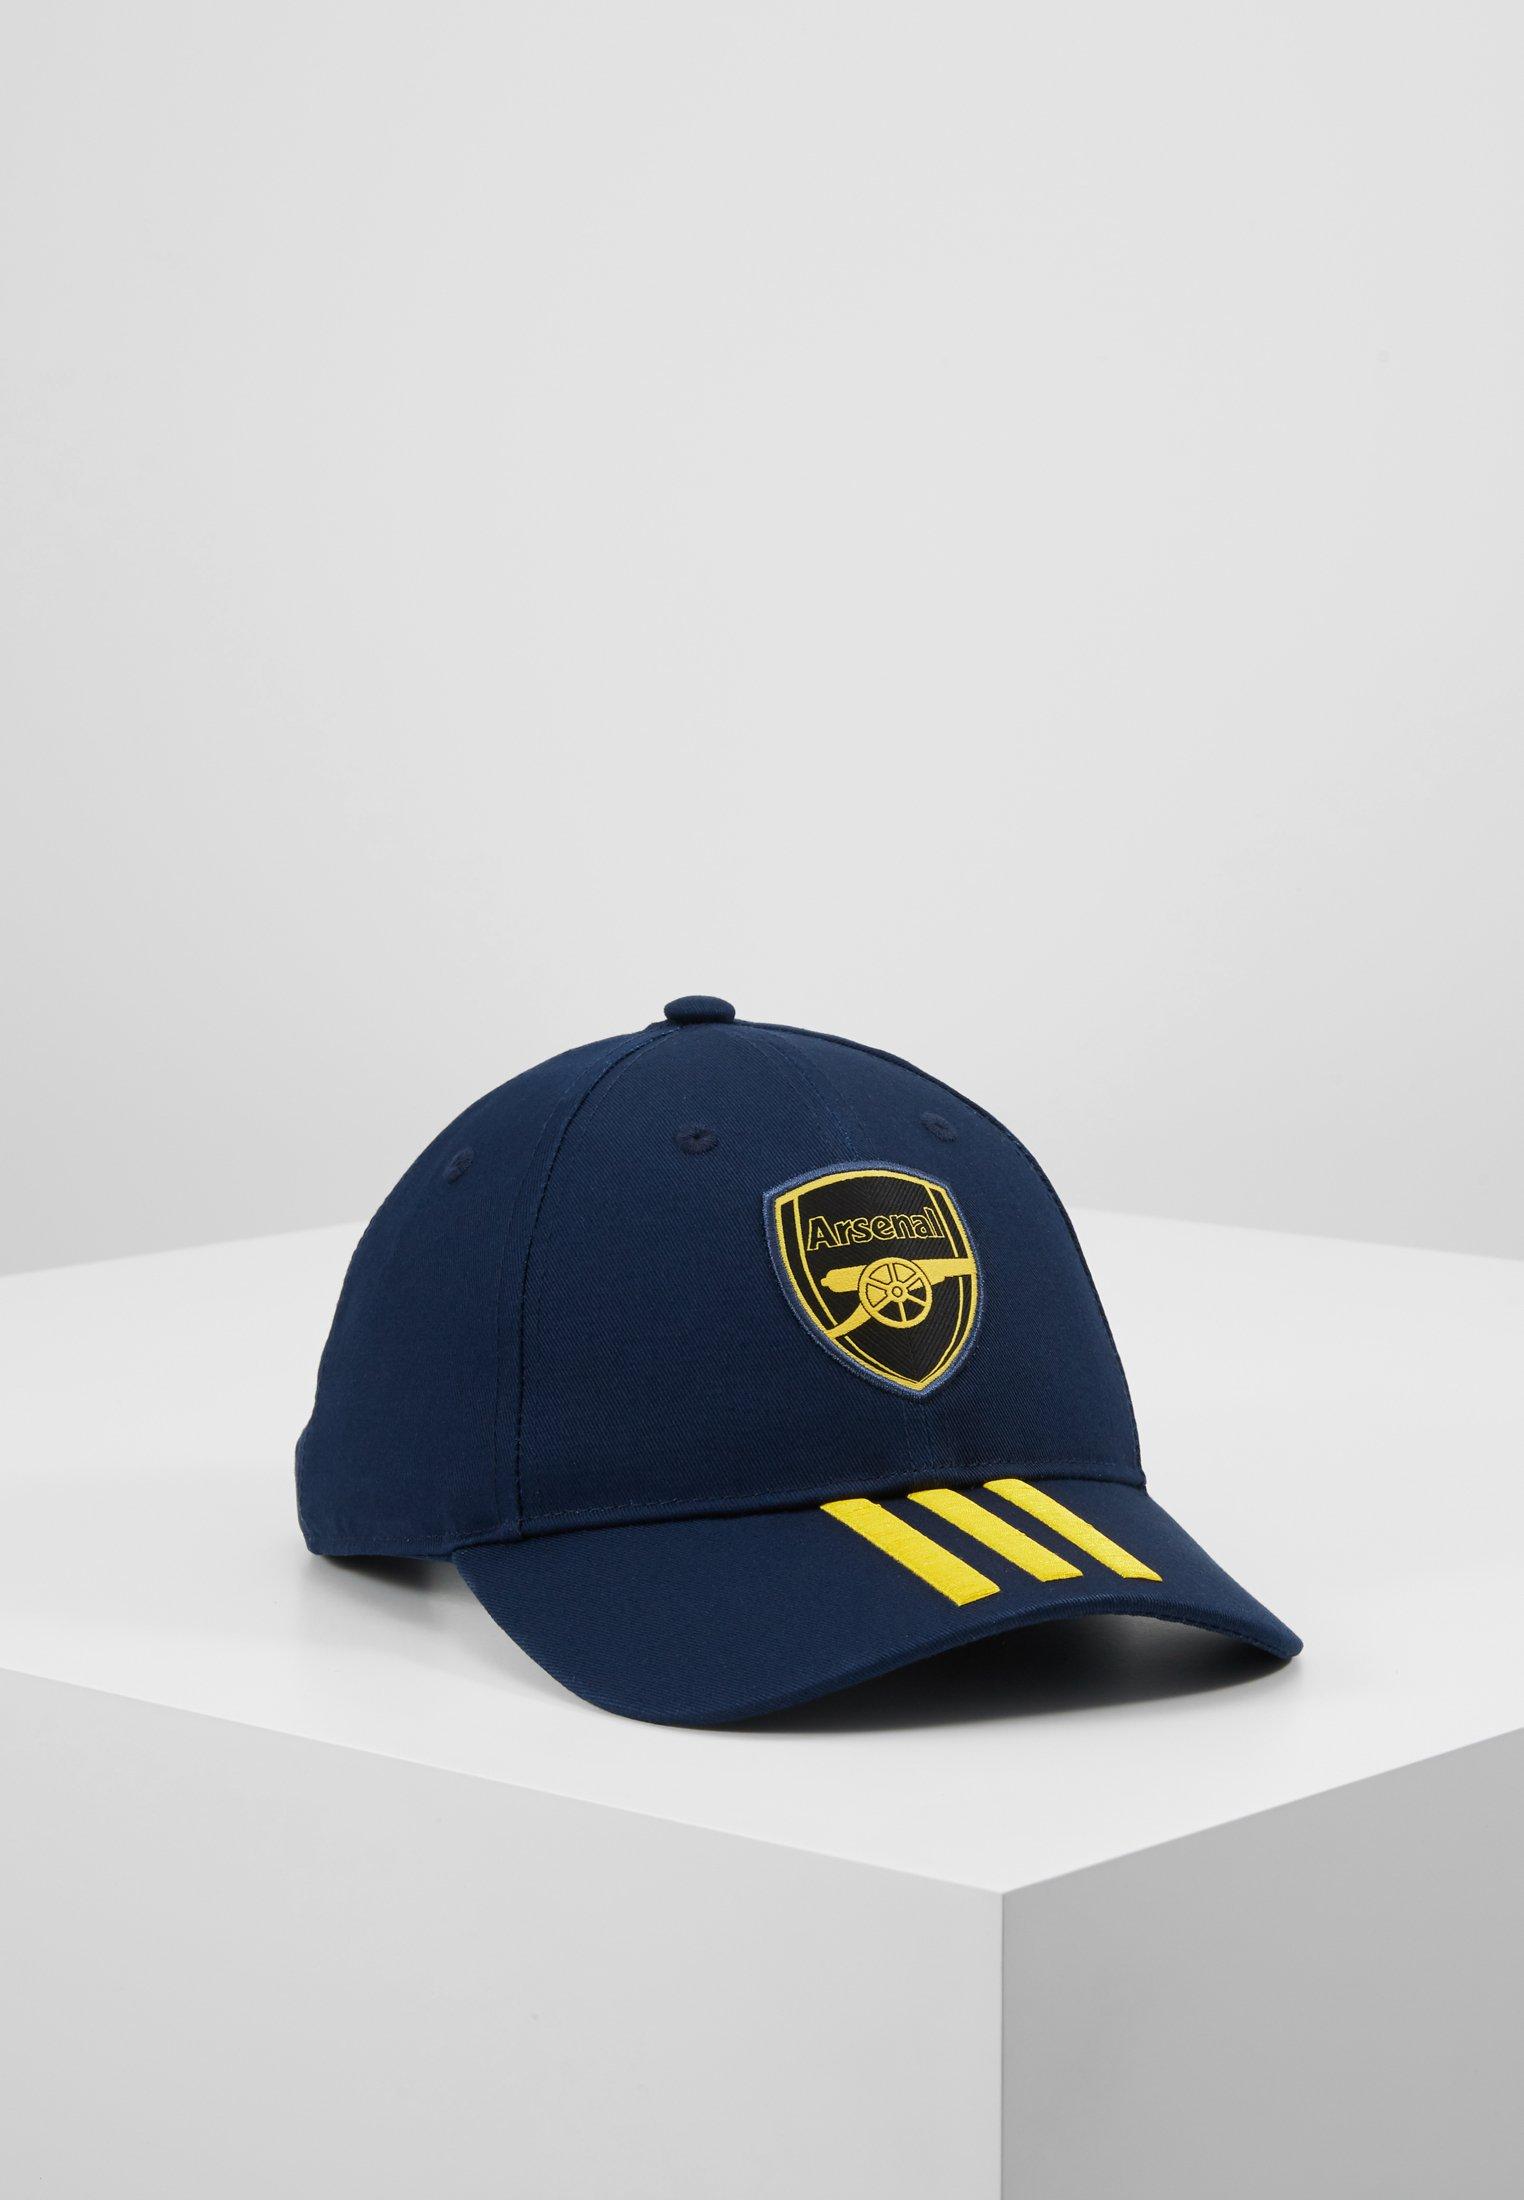 adidas Performance ARESENAL LONDON FC - Cap collegiate navy/yellow